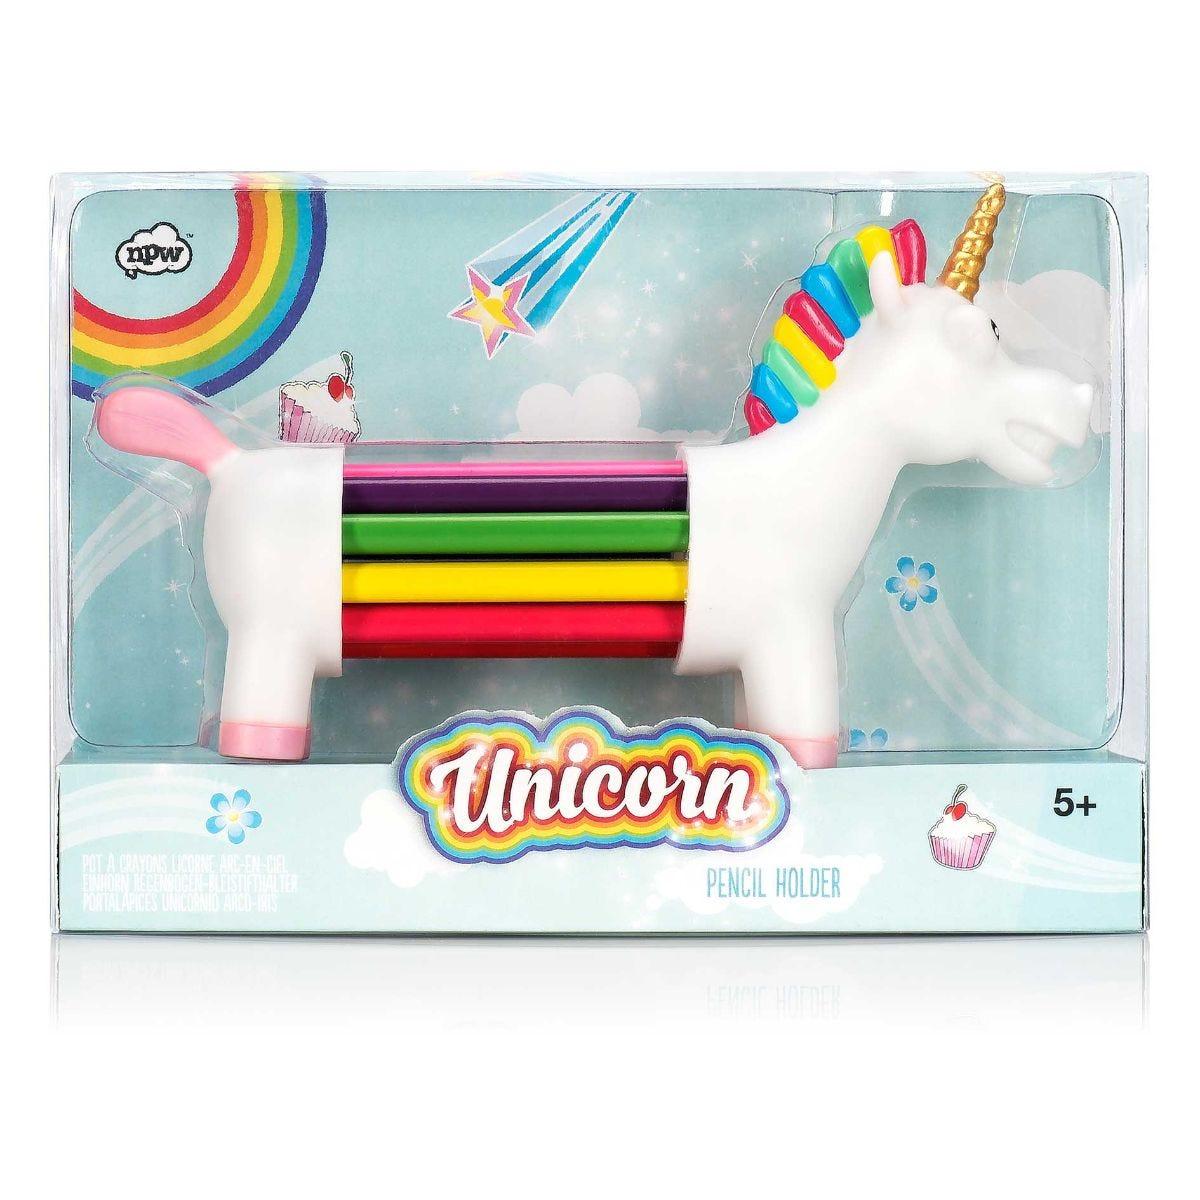 Unicorn Rainbow Pencil Holder, Assorted.